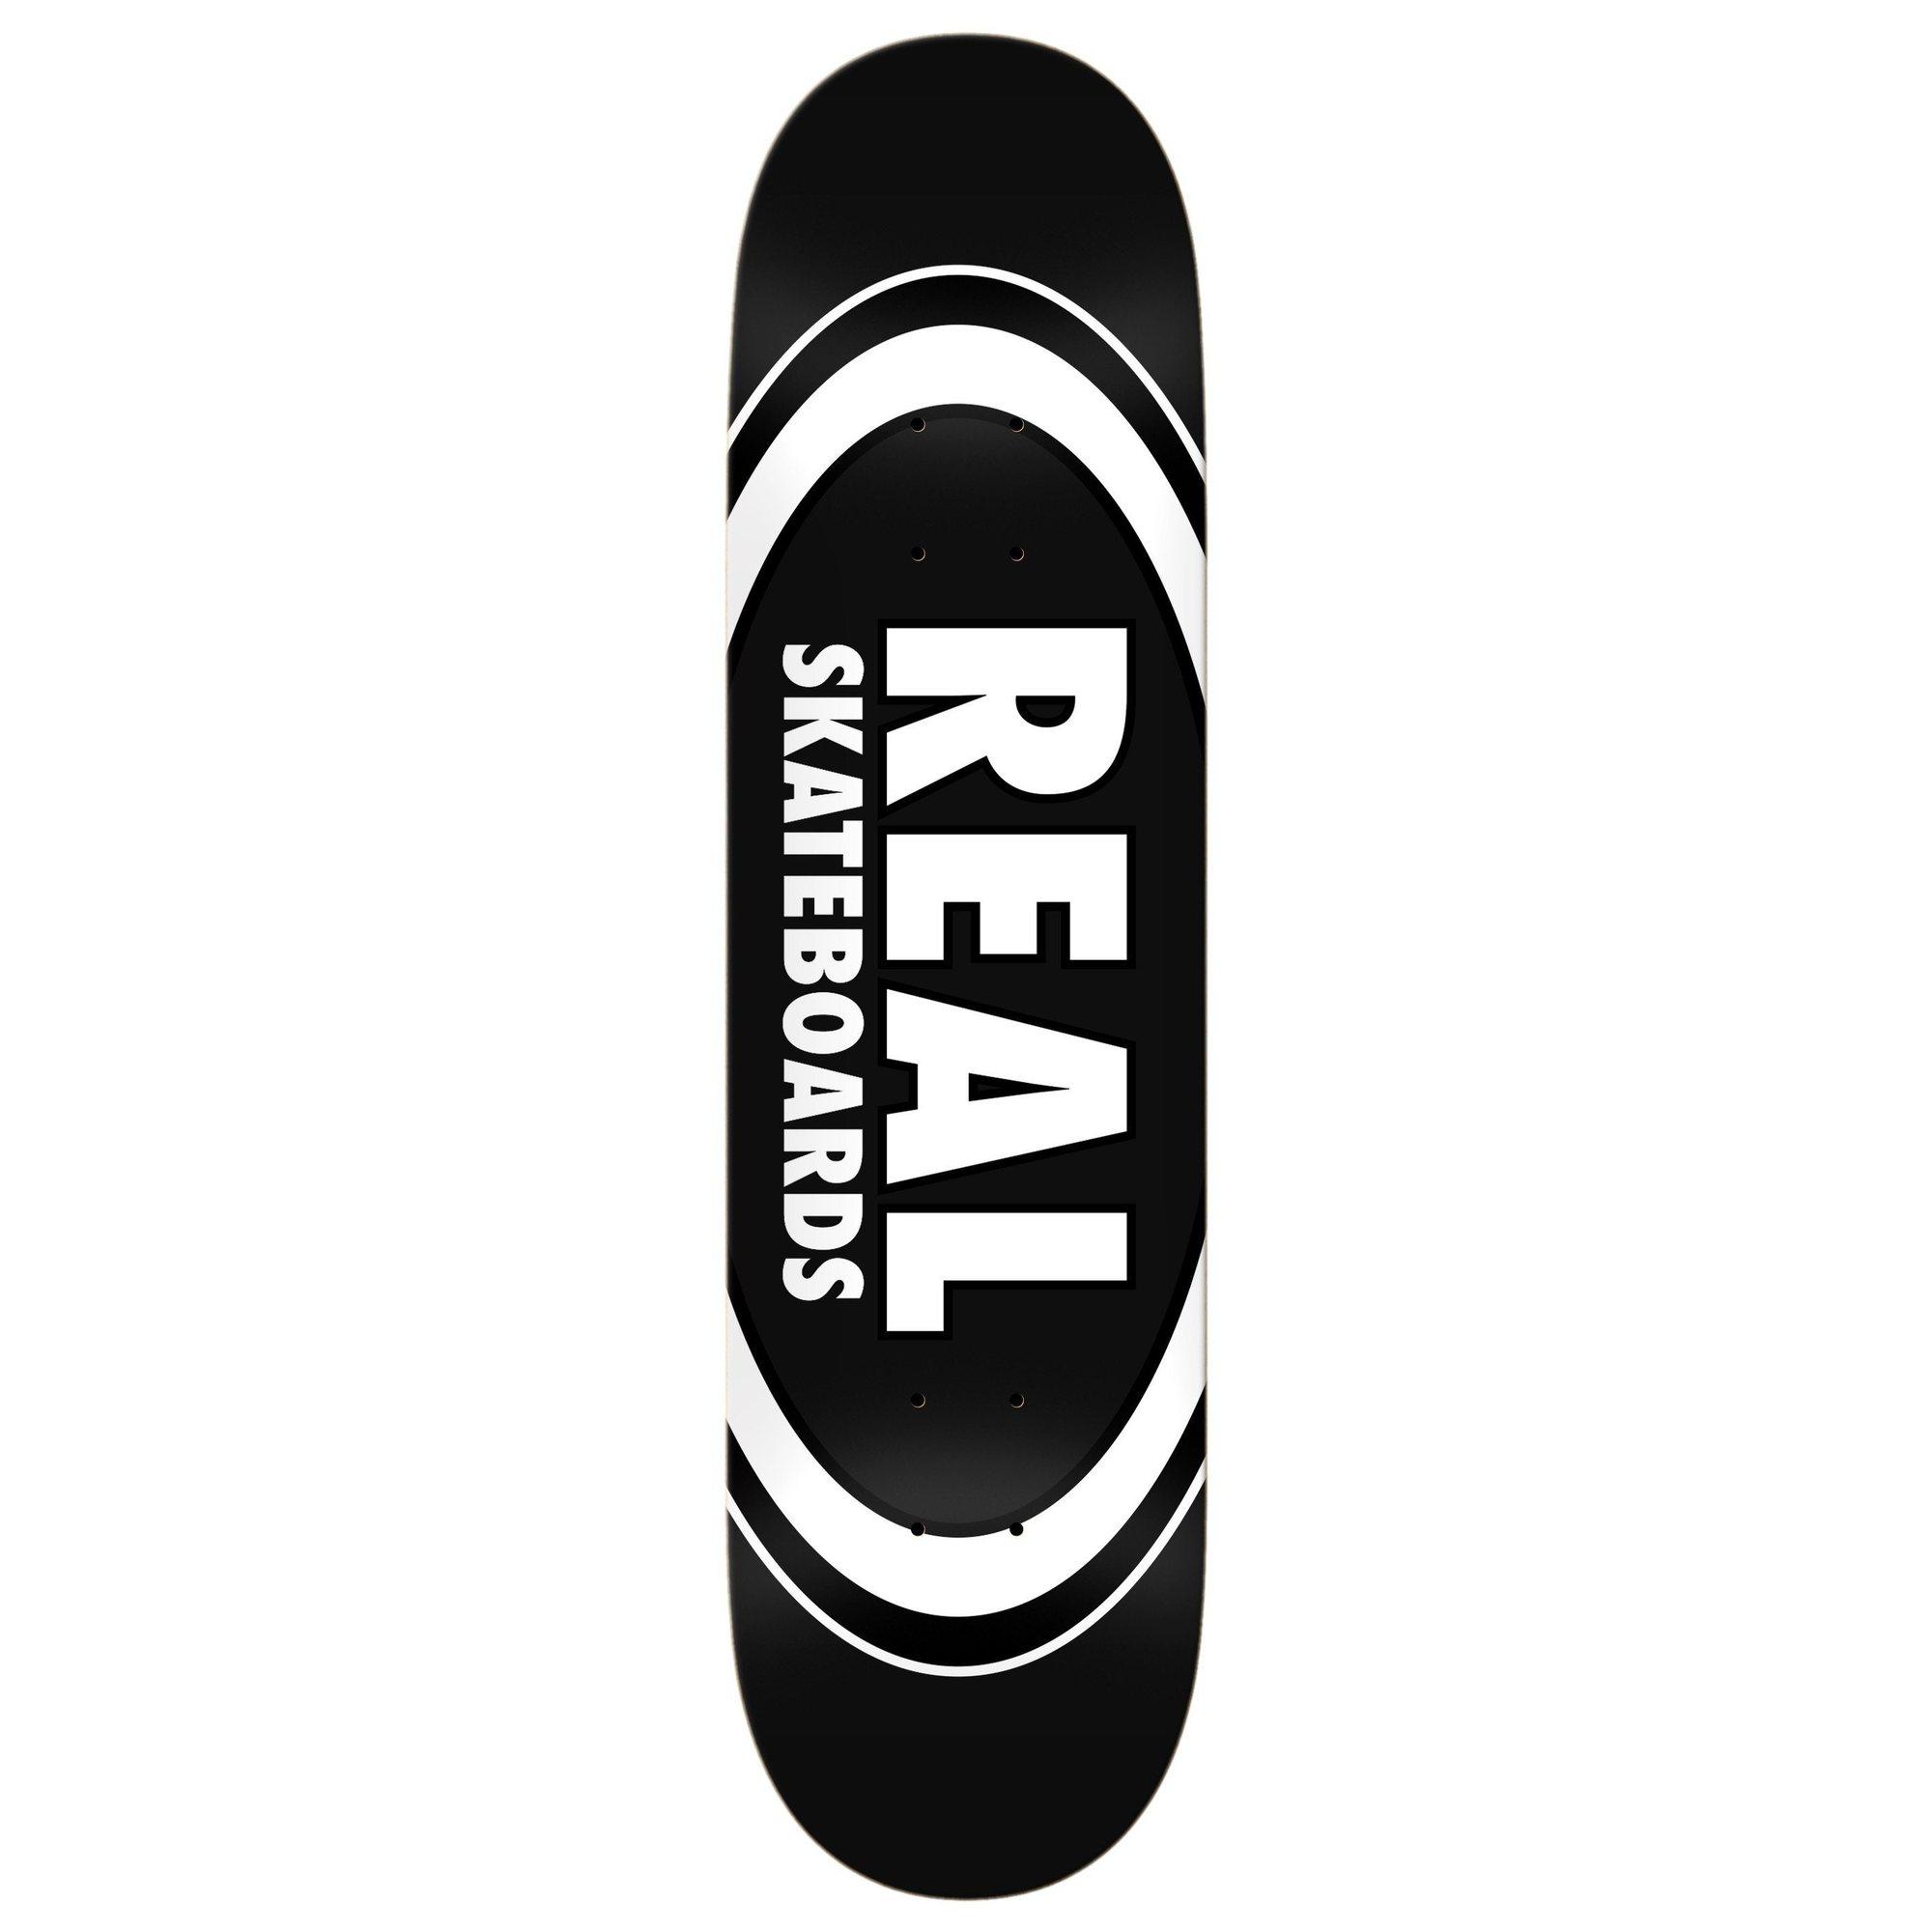 Real Team Classic Oval Skateboard Deck Black 8.25